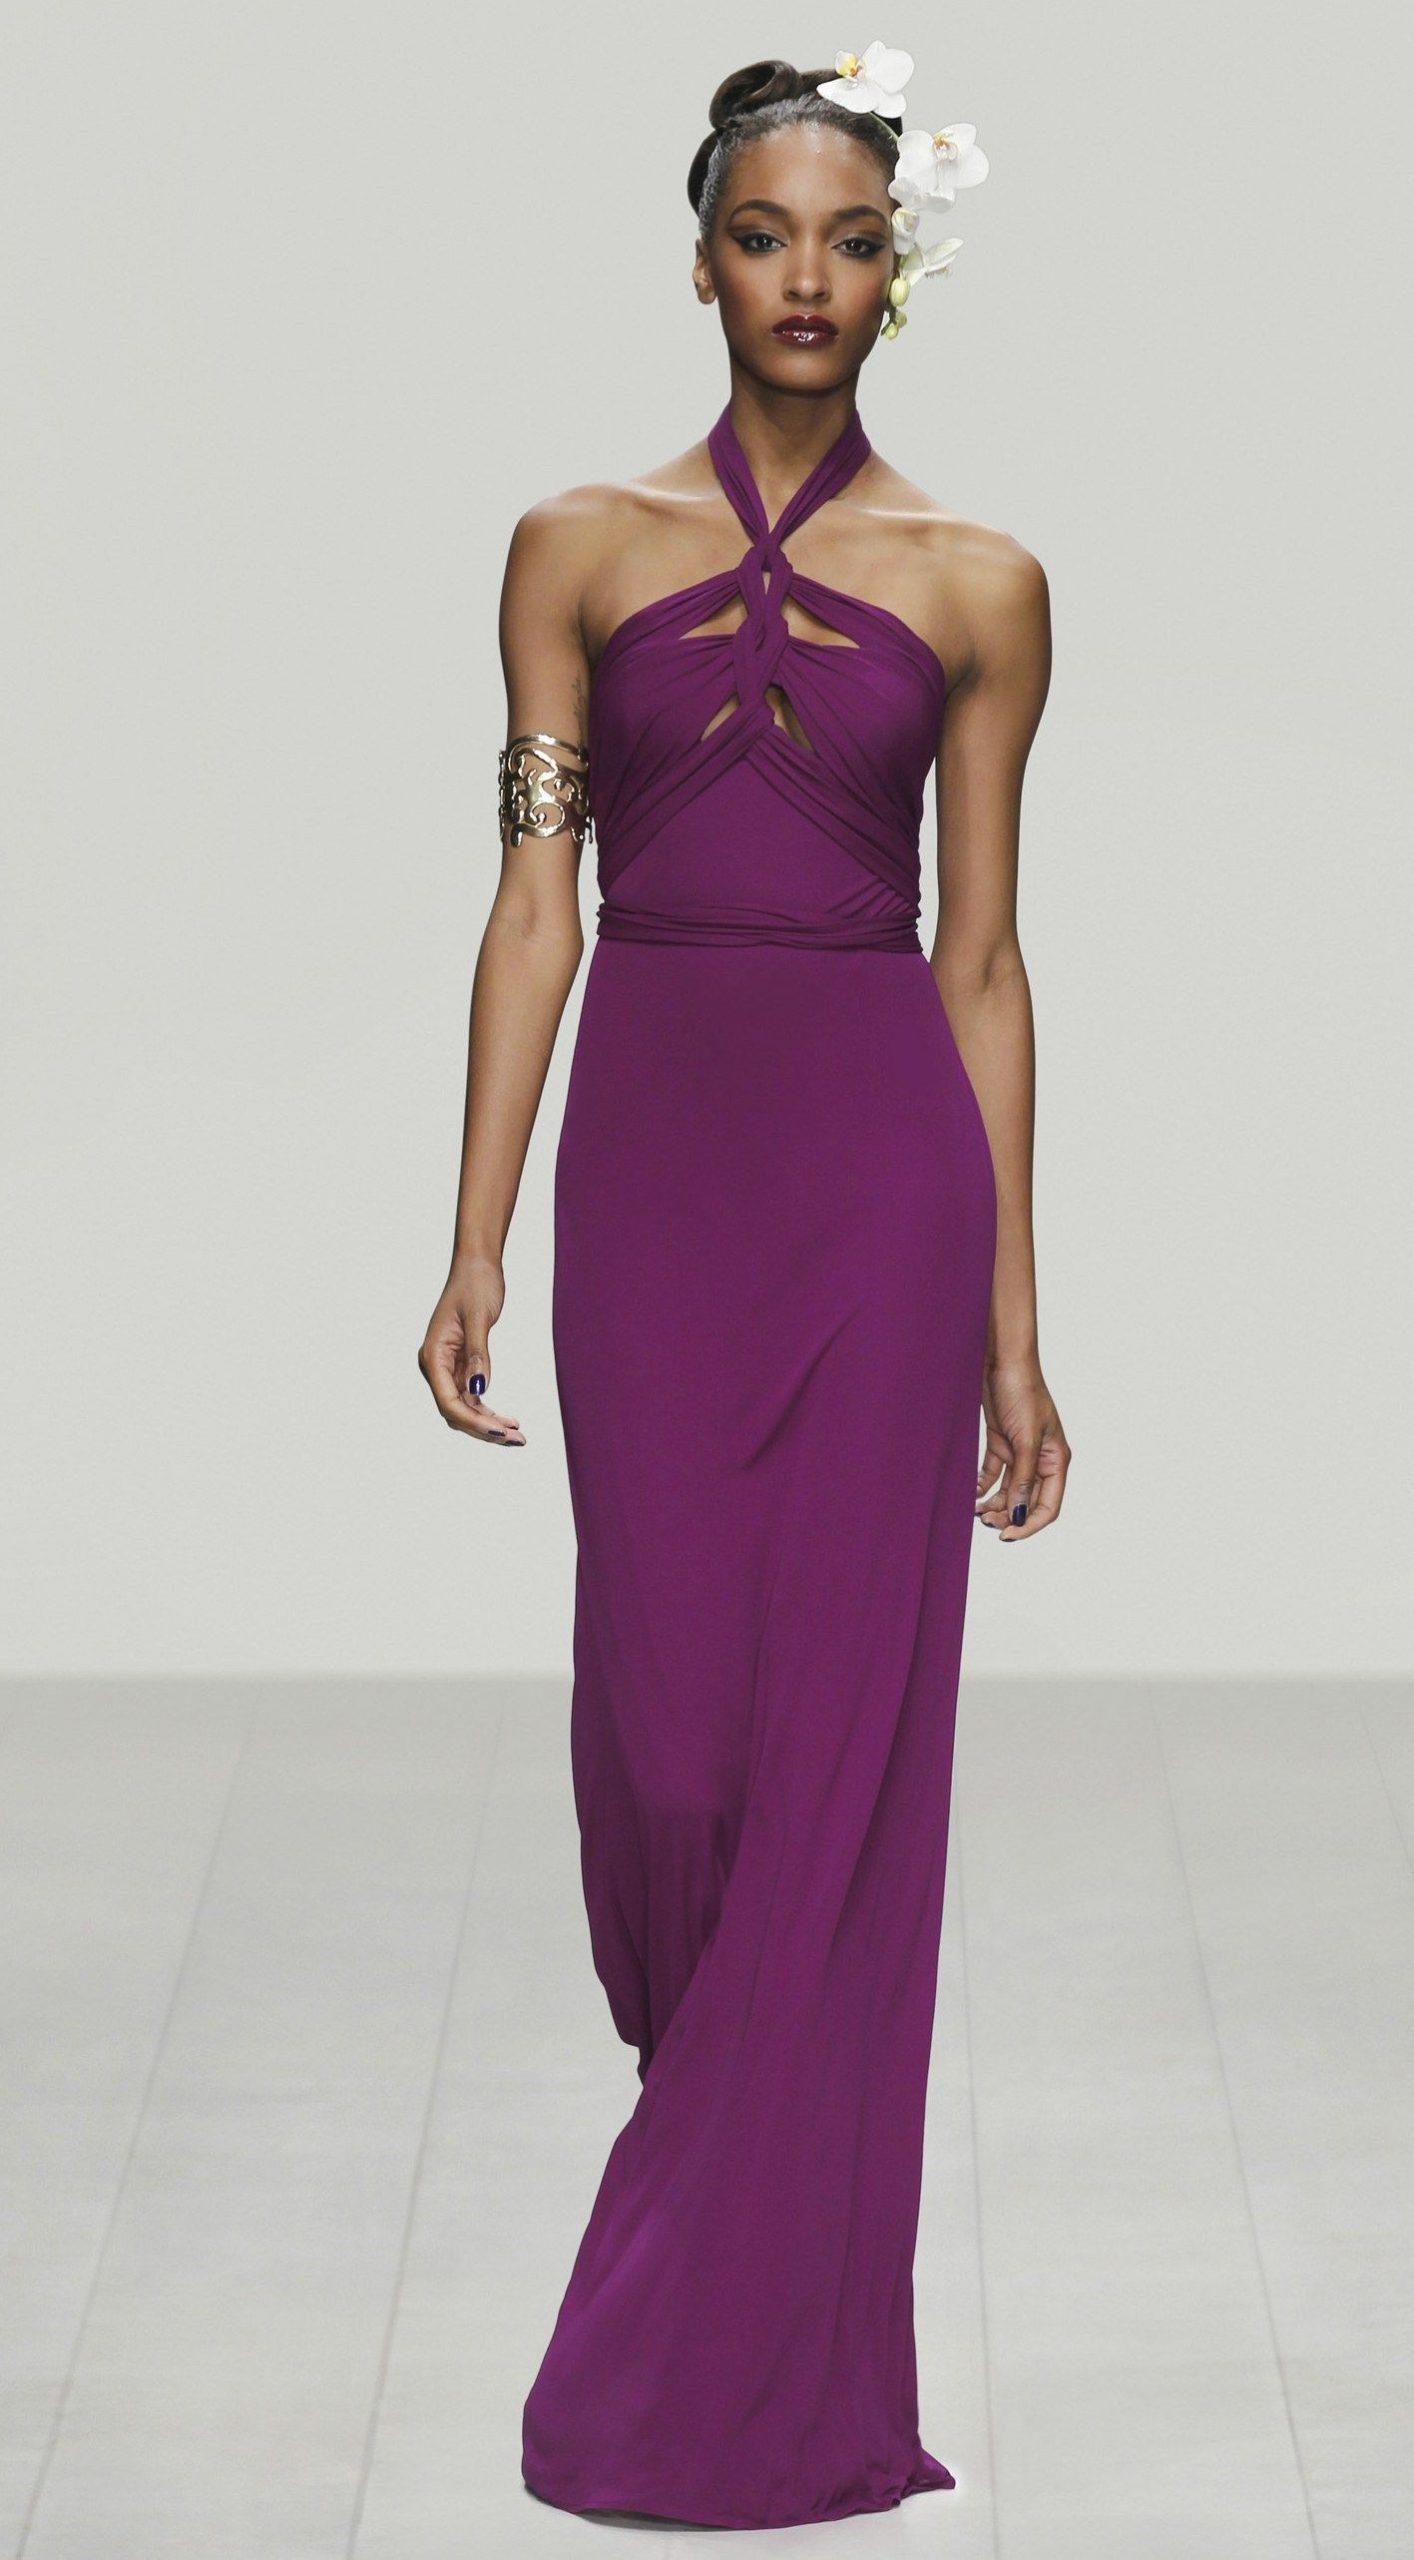 Formal Luxus Abendkleider Lang Seide Boutique17 Top Abendkleider Lang Seide Design